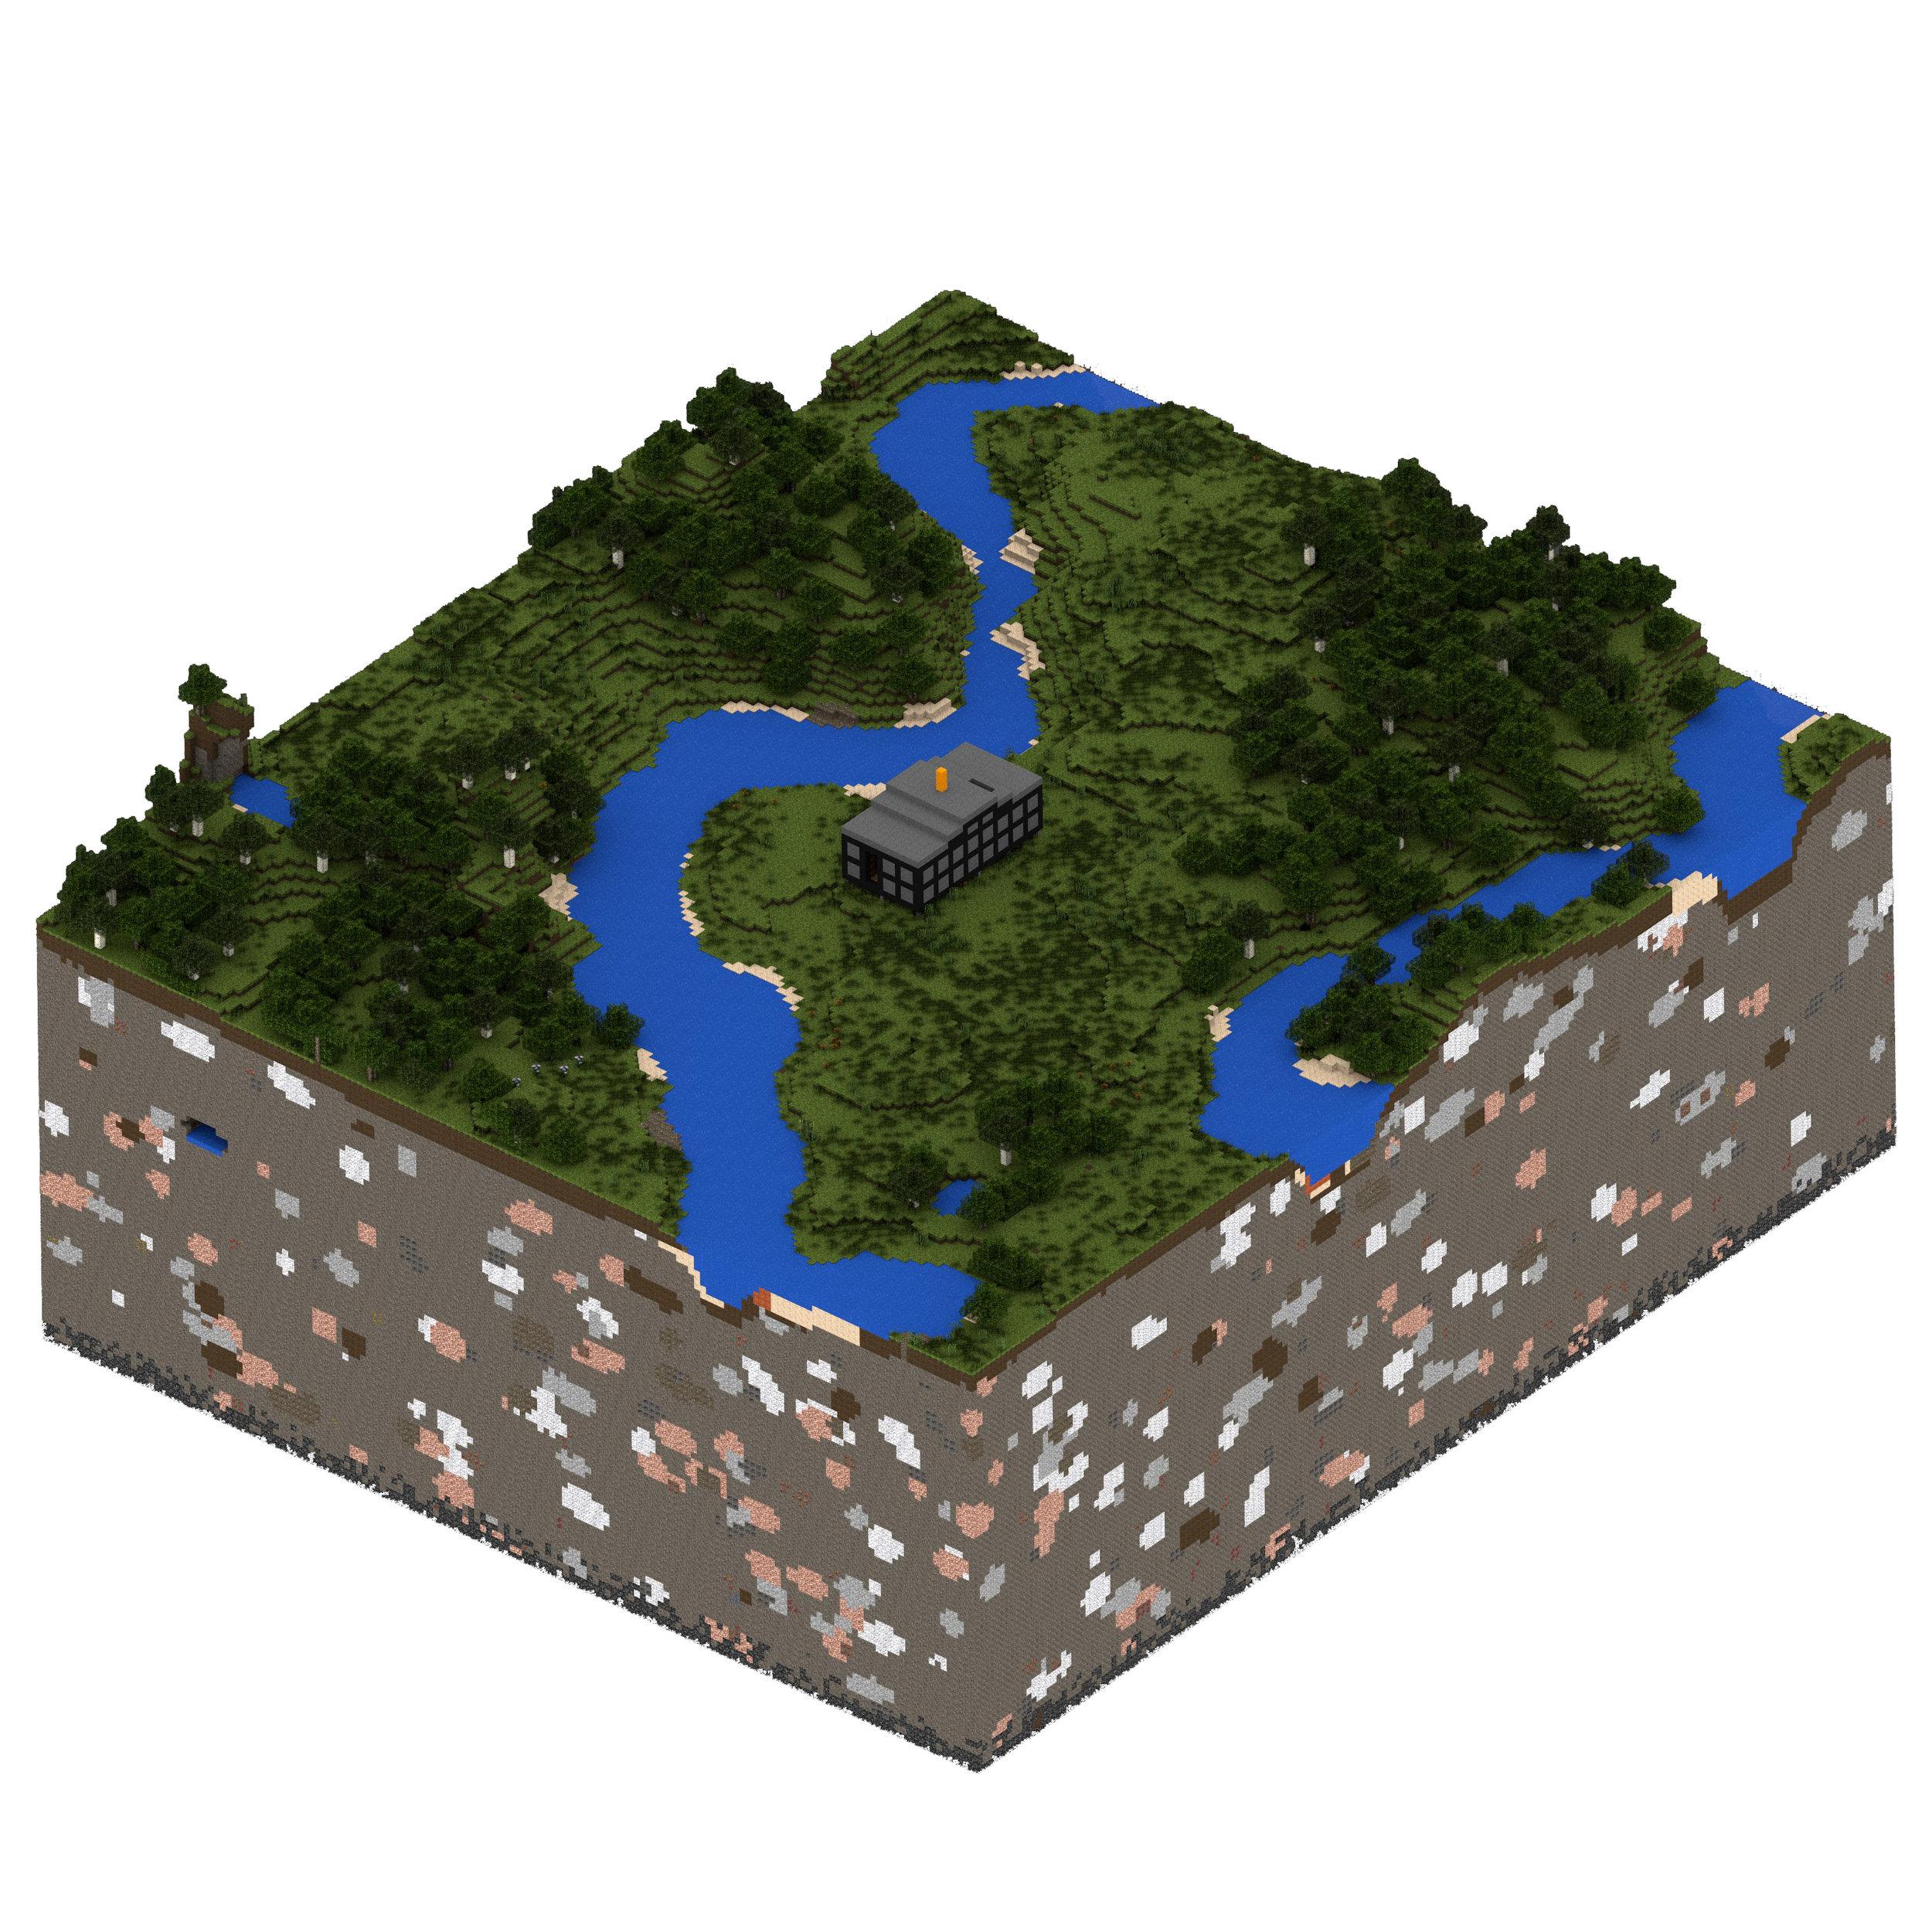 Shed - minecraft render